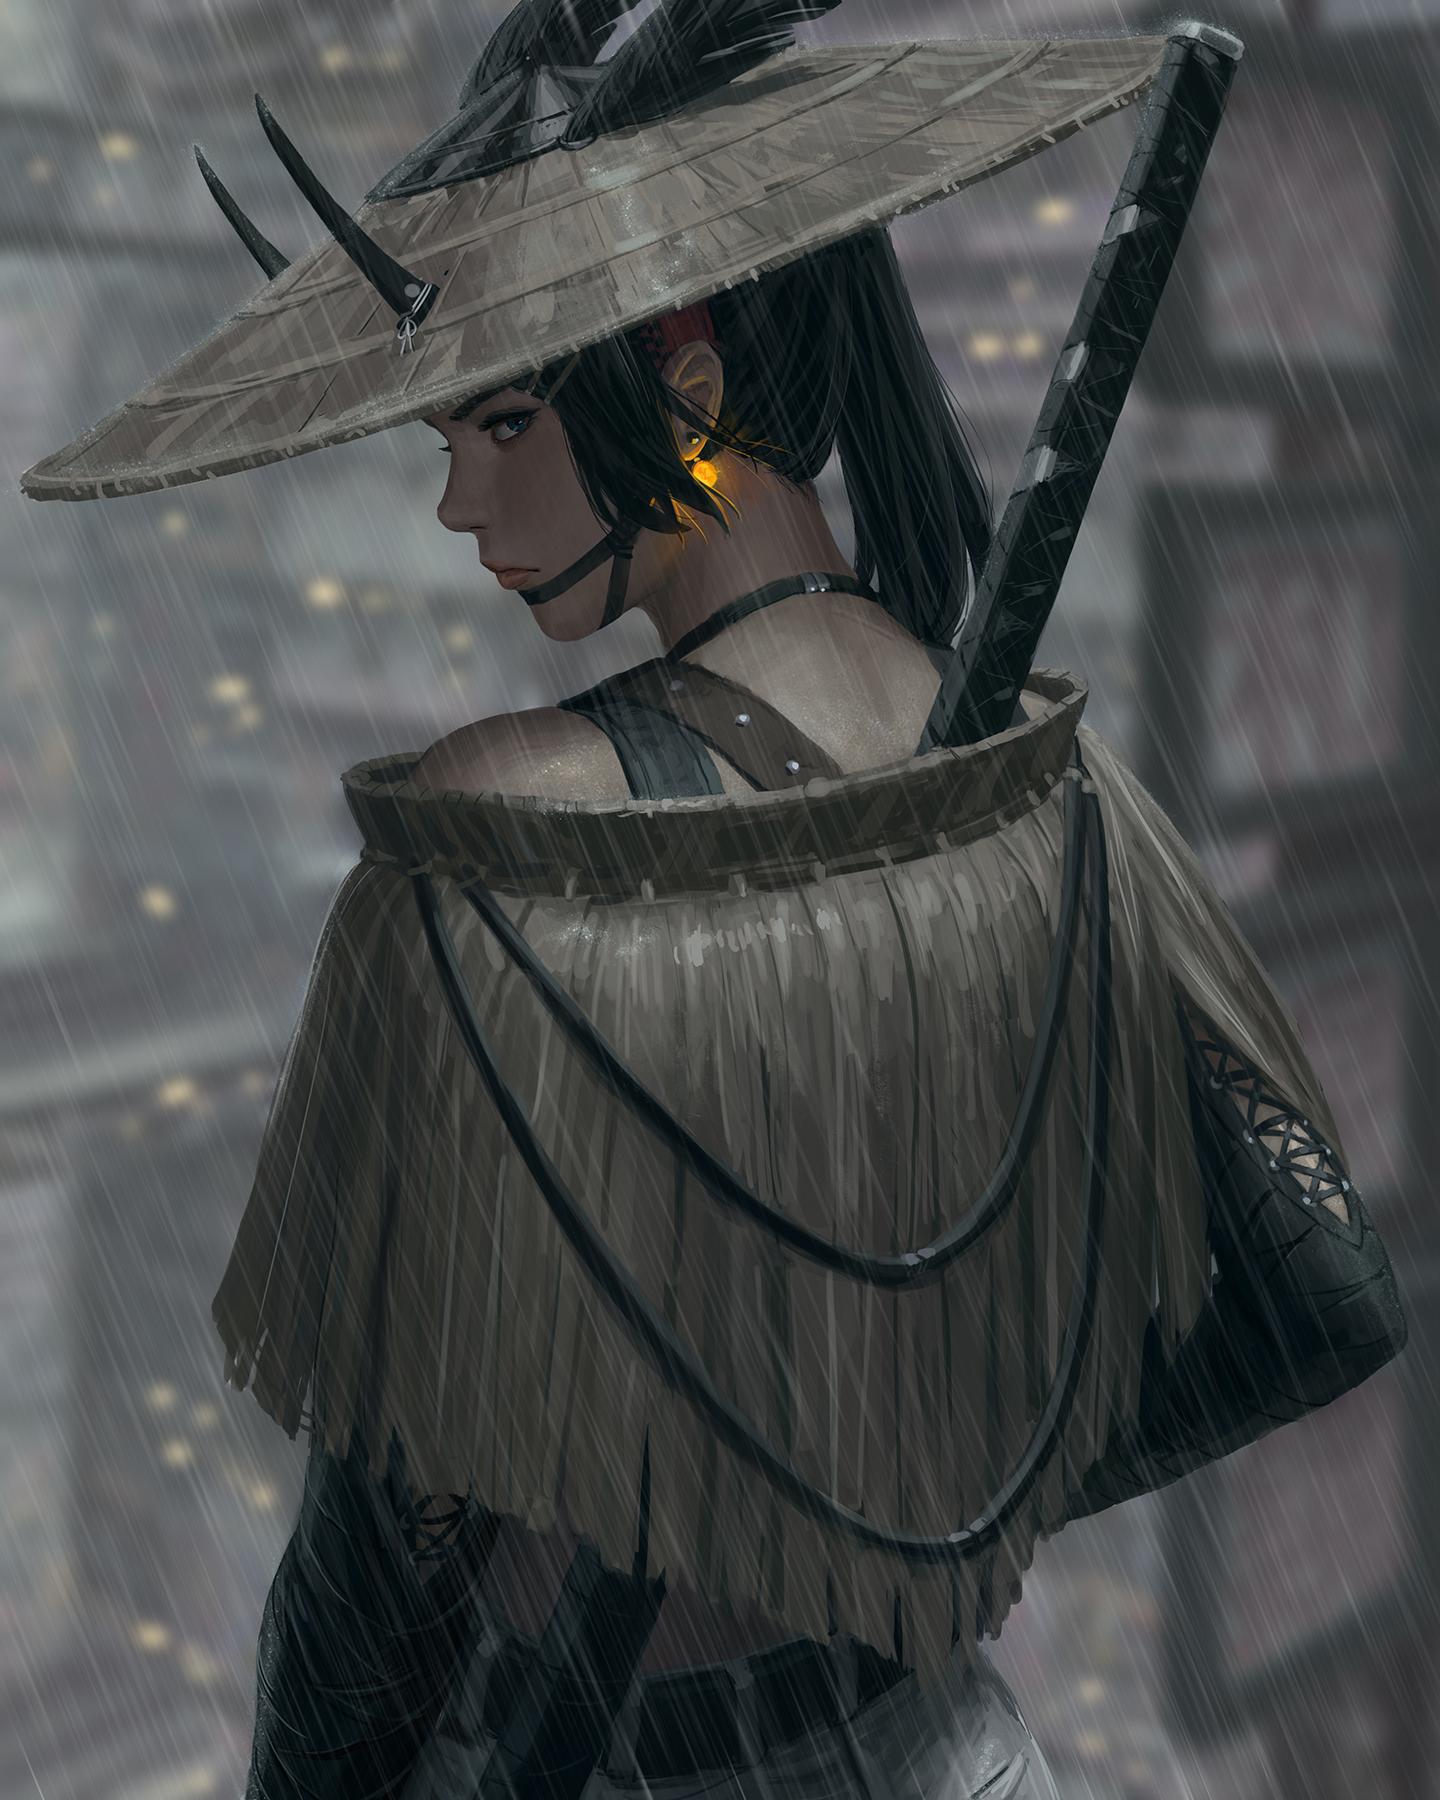 General 1440x1800 GUWEIZ digital art artwork digital painting fictional character katana bare shoulders hat women shinobi drawing rain